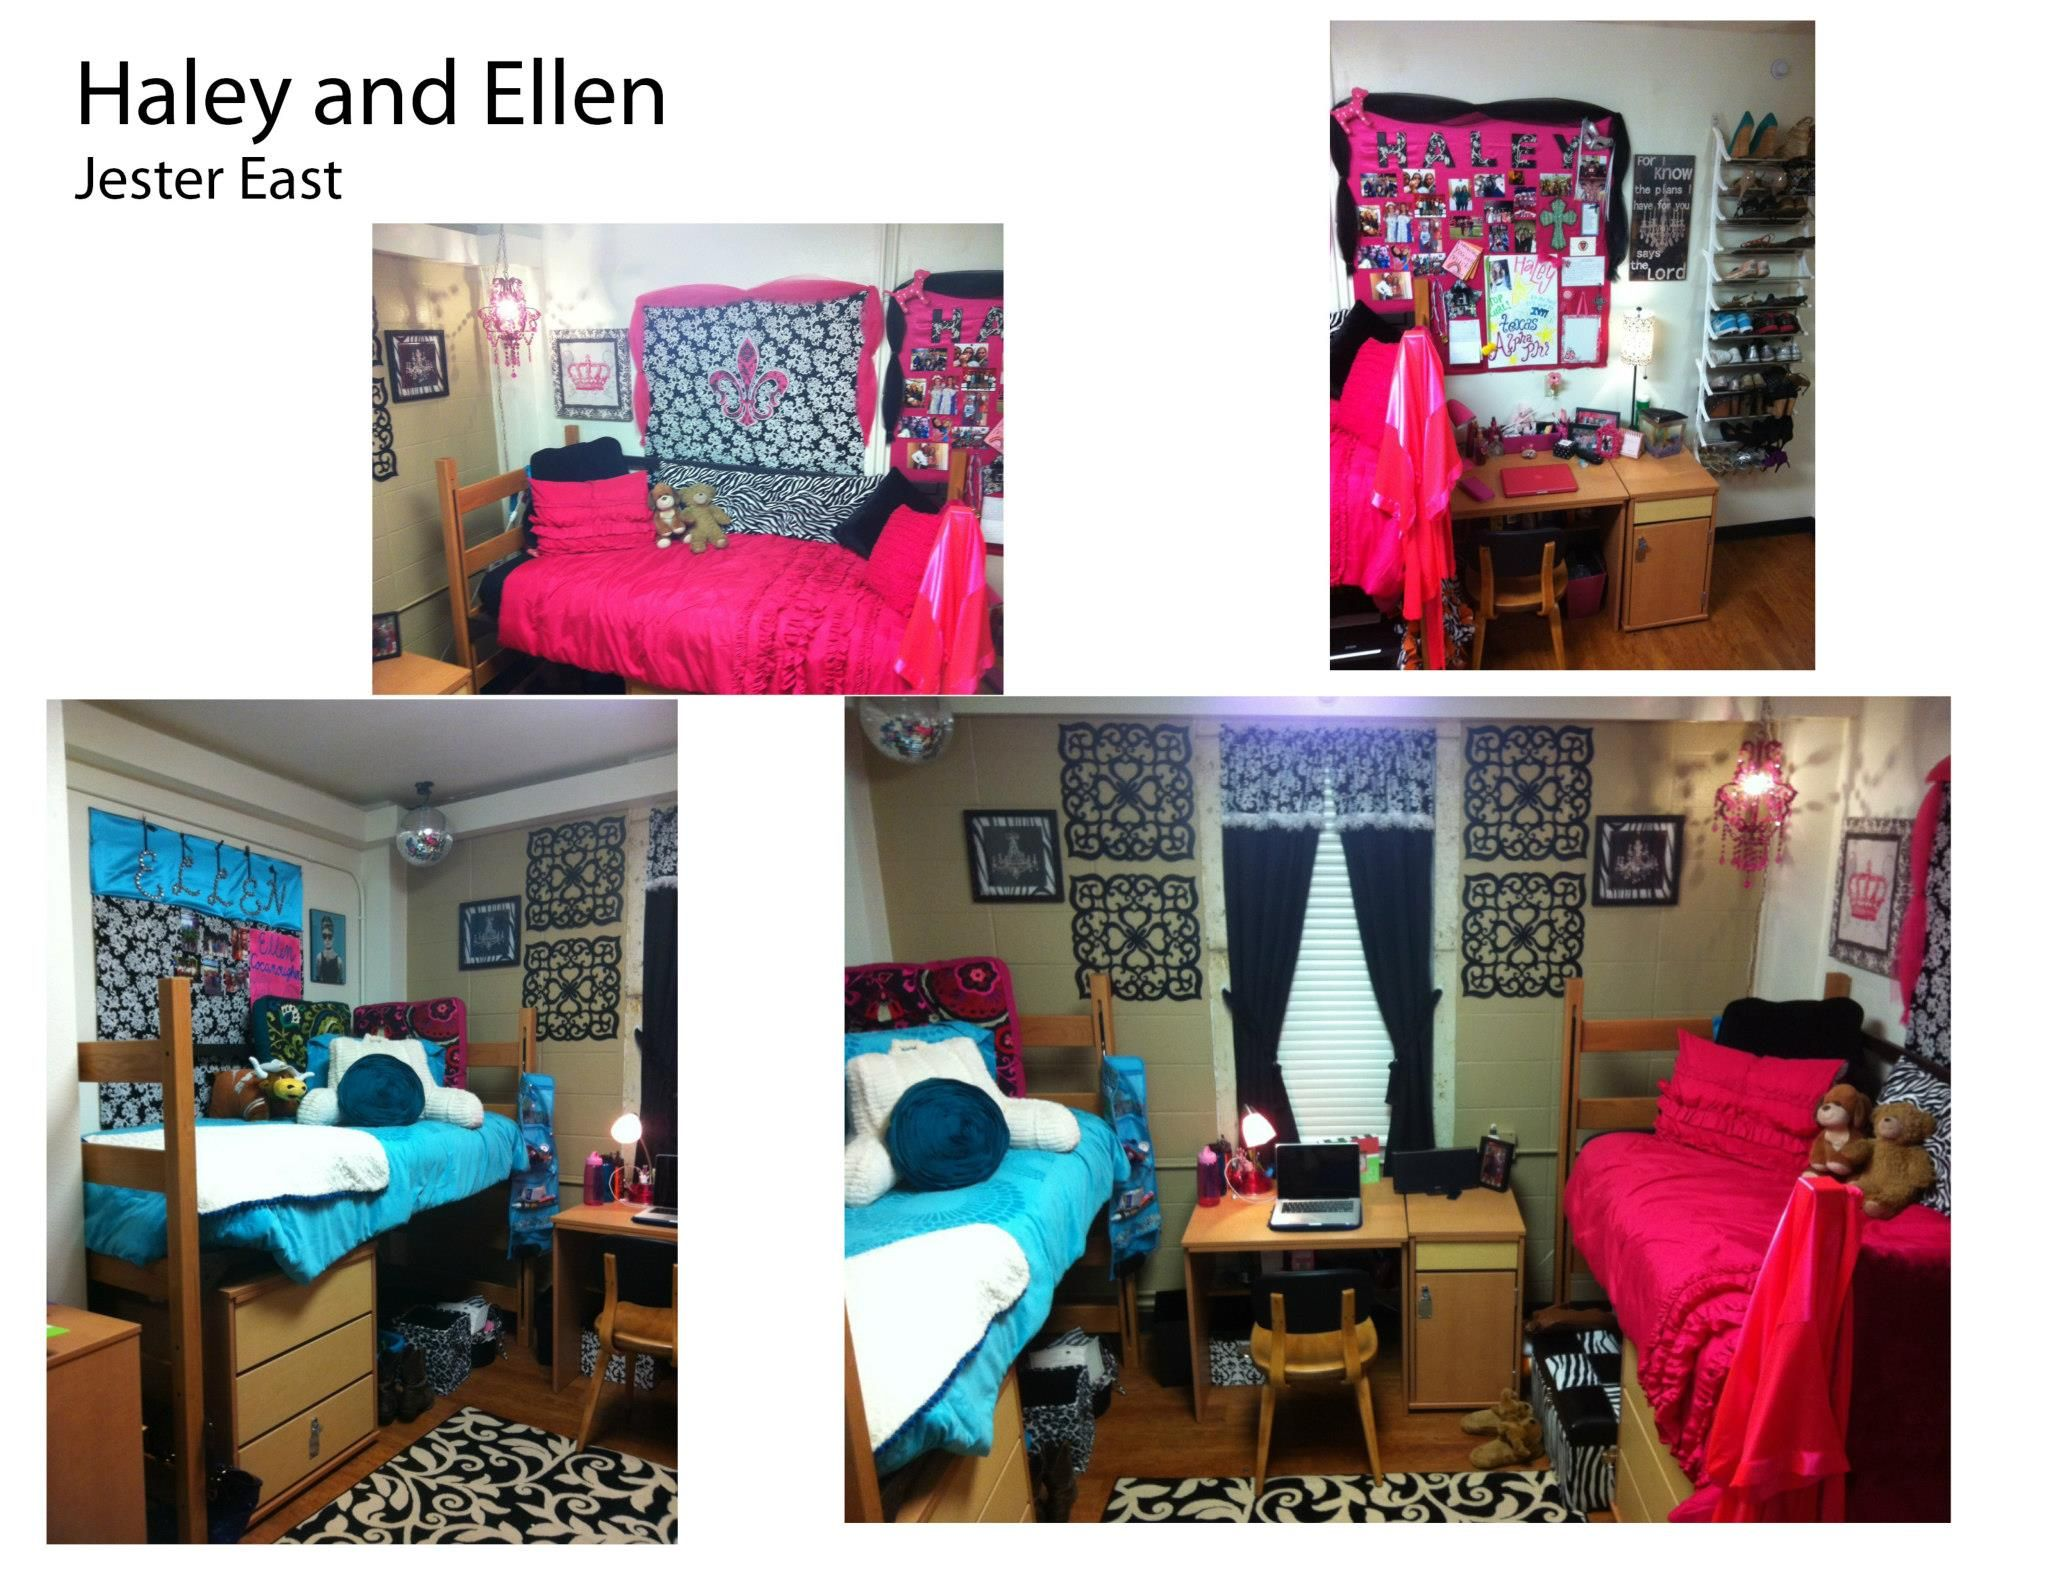 One Of The Top Ten Rooms In UT My Pad Room Design Contest